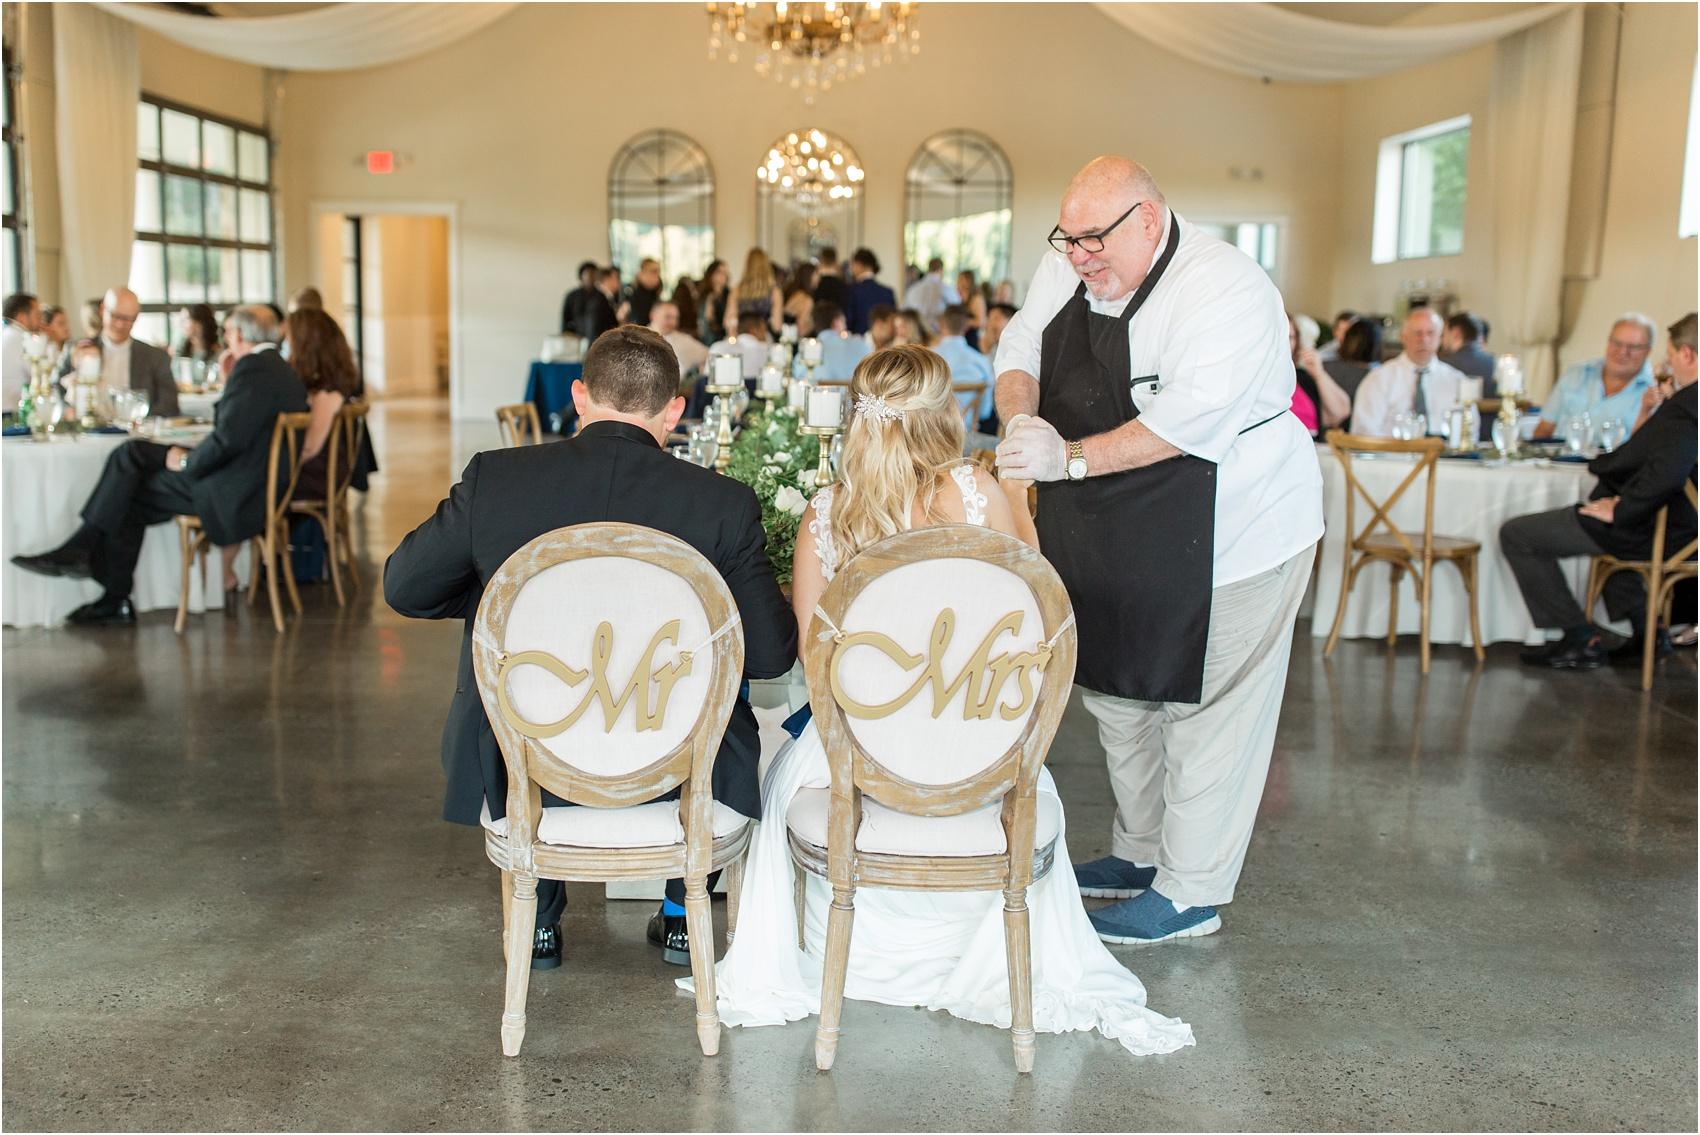 Savannah Eve Photography- Jurek-Woodworth Wedding- Sneak Peek-85.jpg